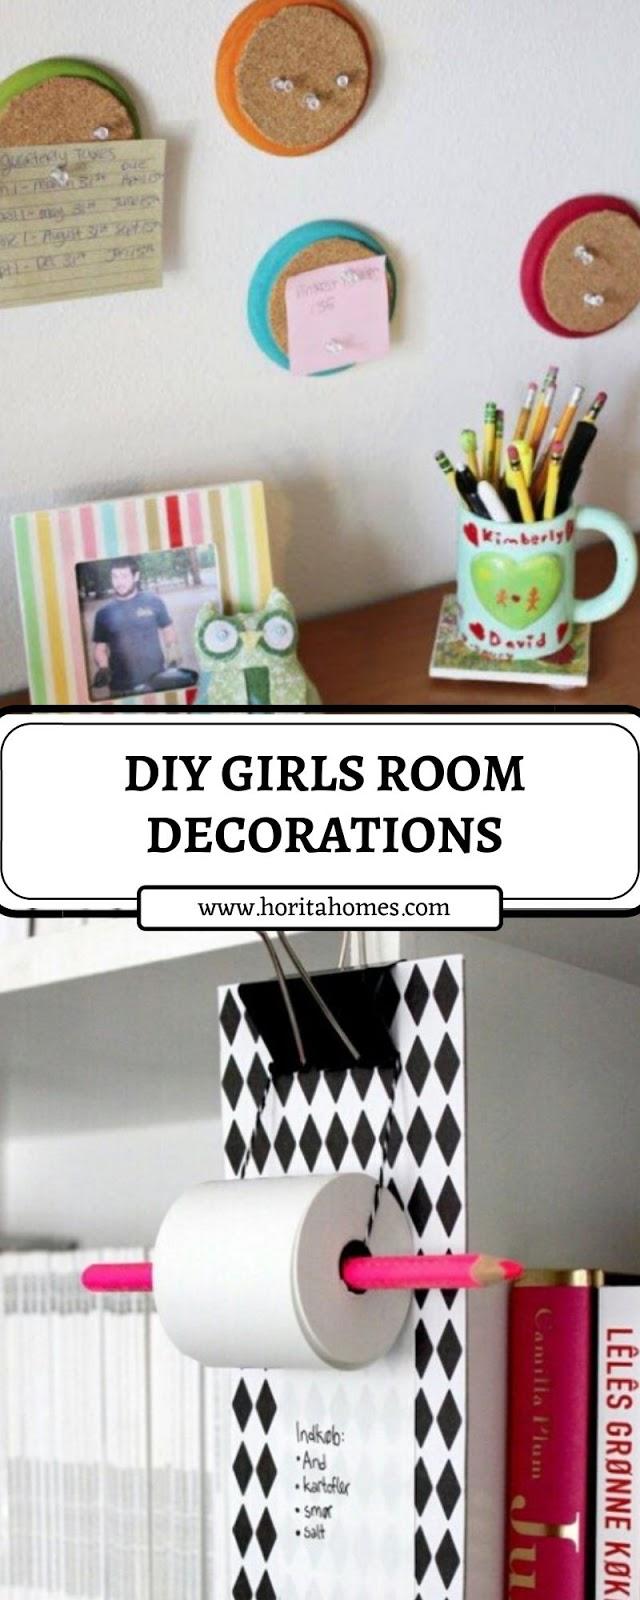 DIY GIRLS ROOM DECORATIONS